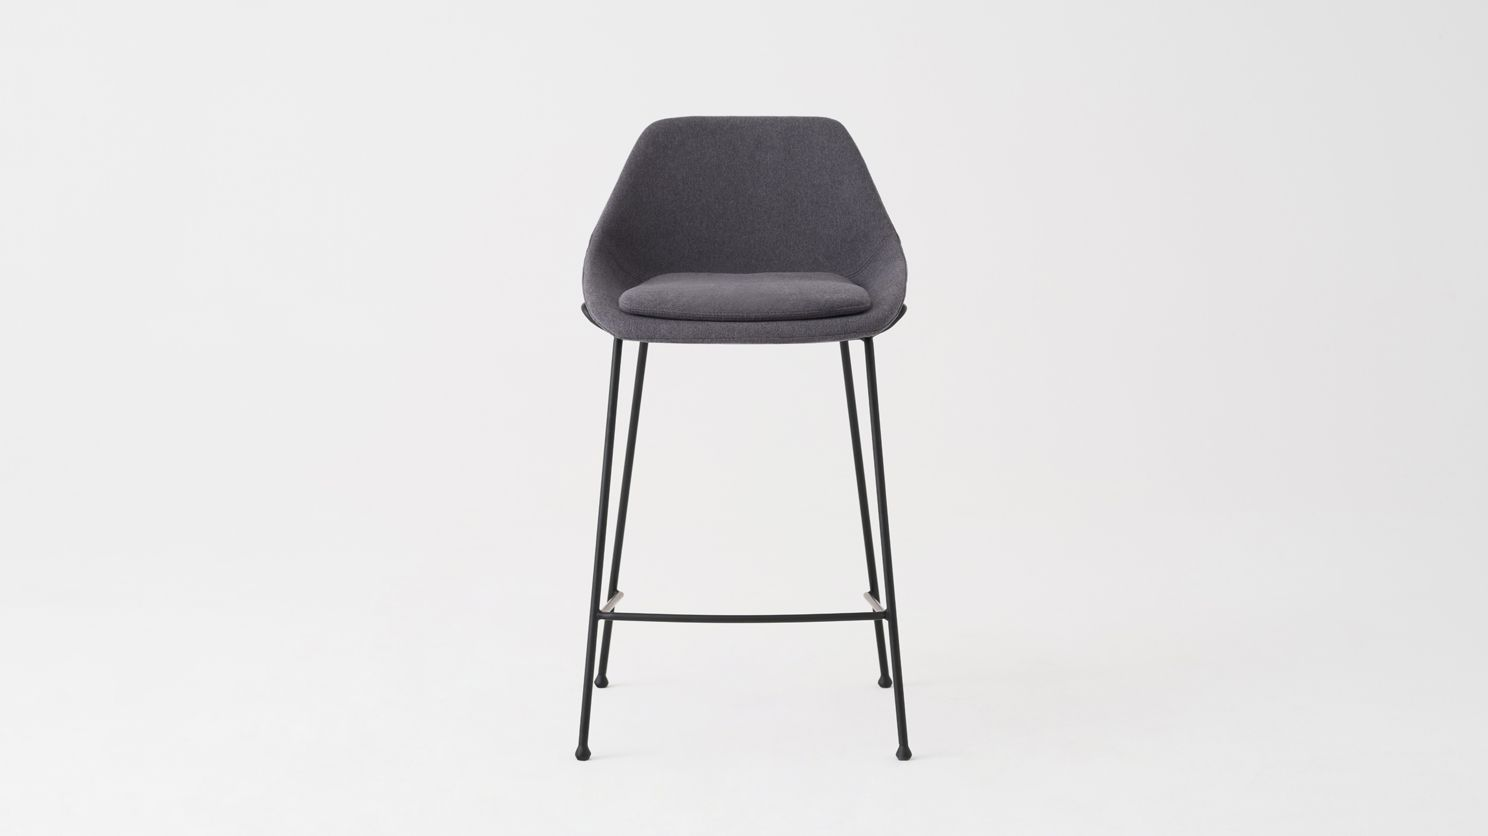 Groovy Eq3 Nixon Counter Stool 20W X 21 2D X 36H Kick Height Beatyapartments Chair Design Images Beatyapartmentscom